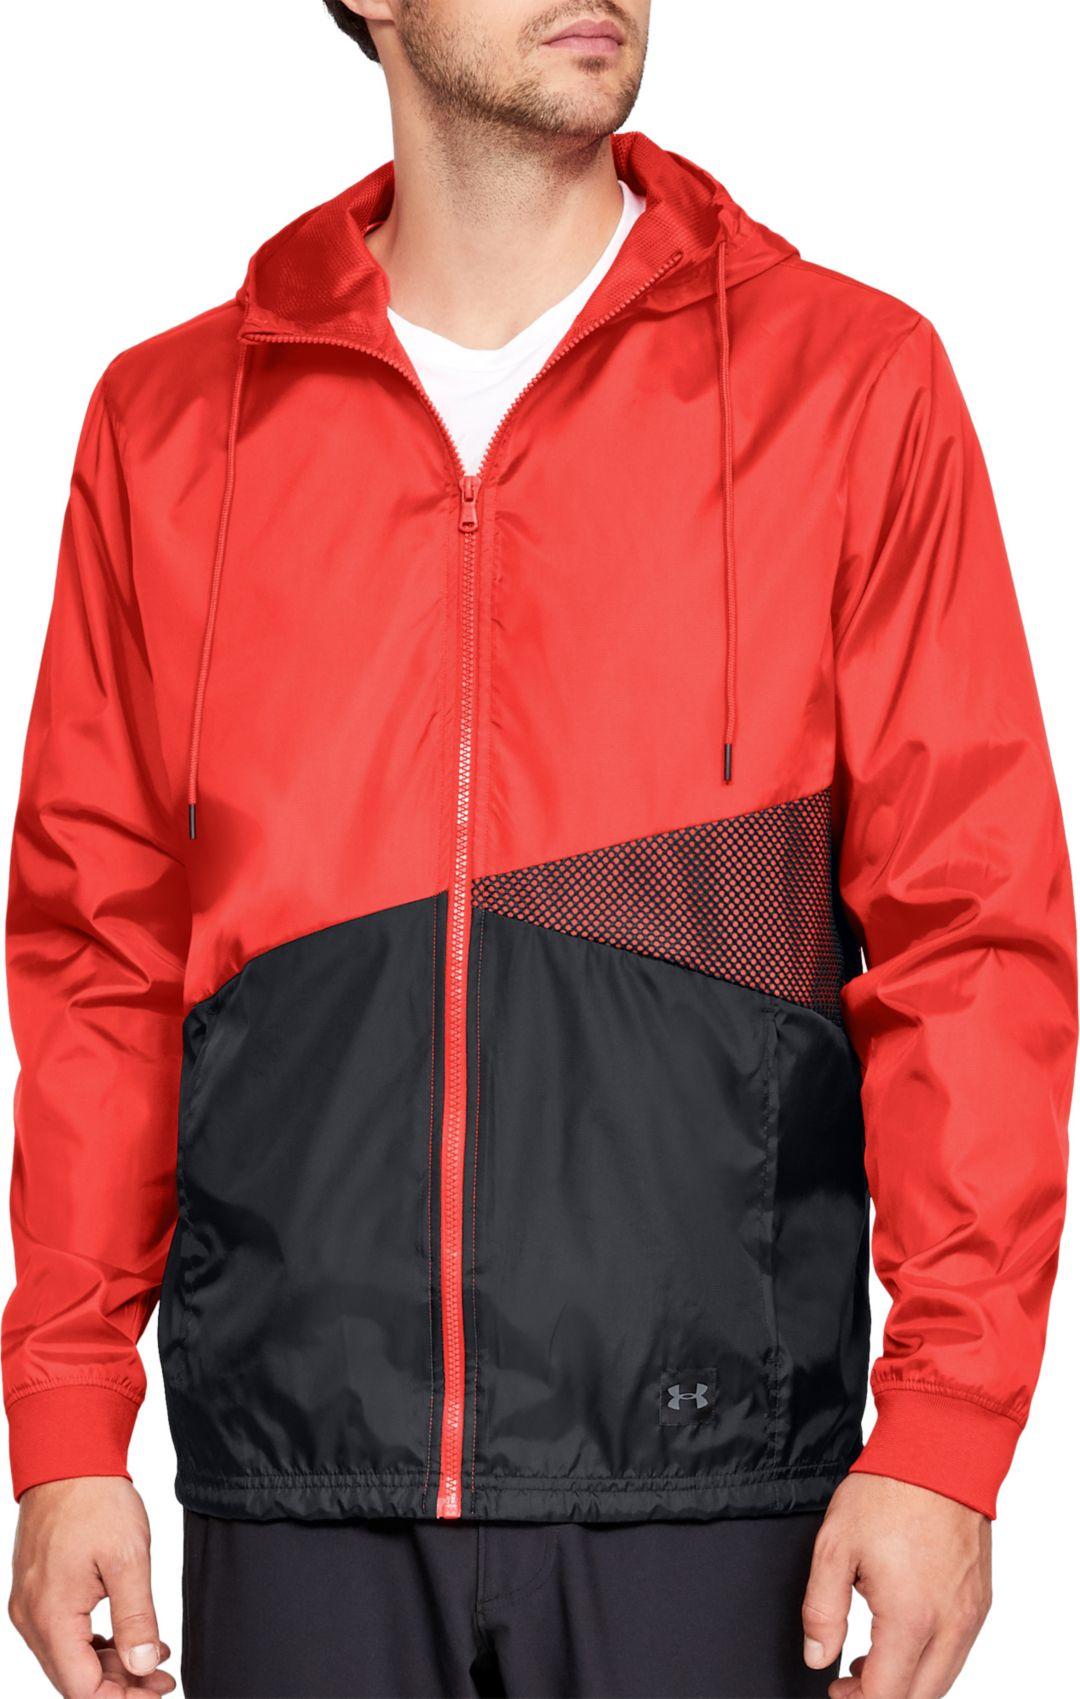 28096aaf6 Under Armour Men's Sportstyle Windbreaker Jacket. noImageFound. Previous